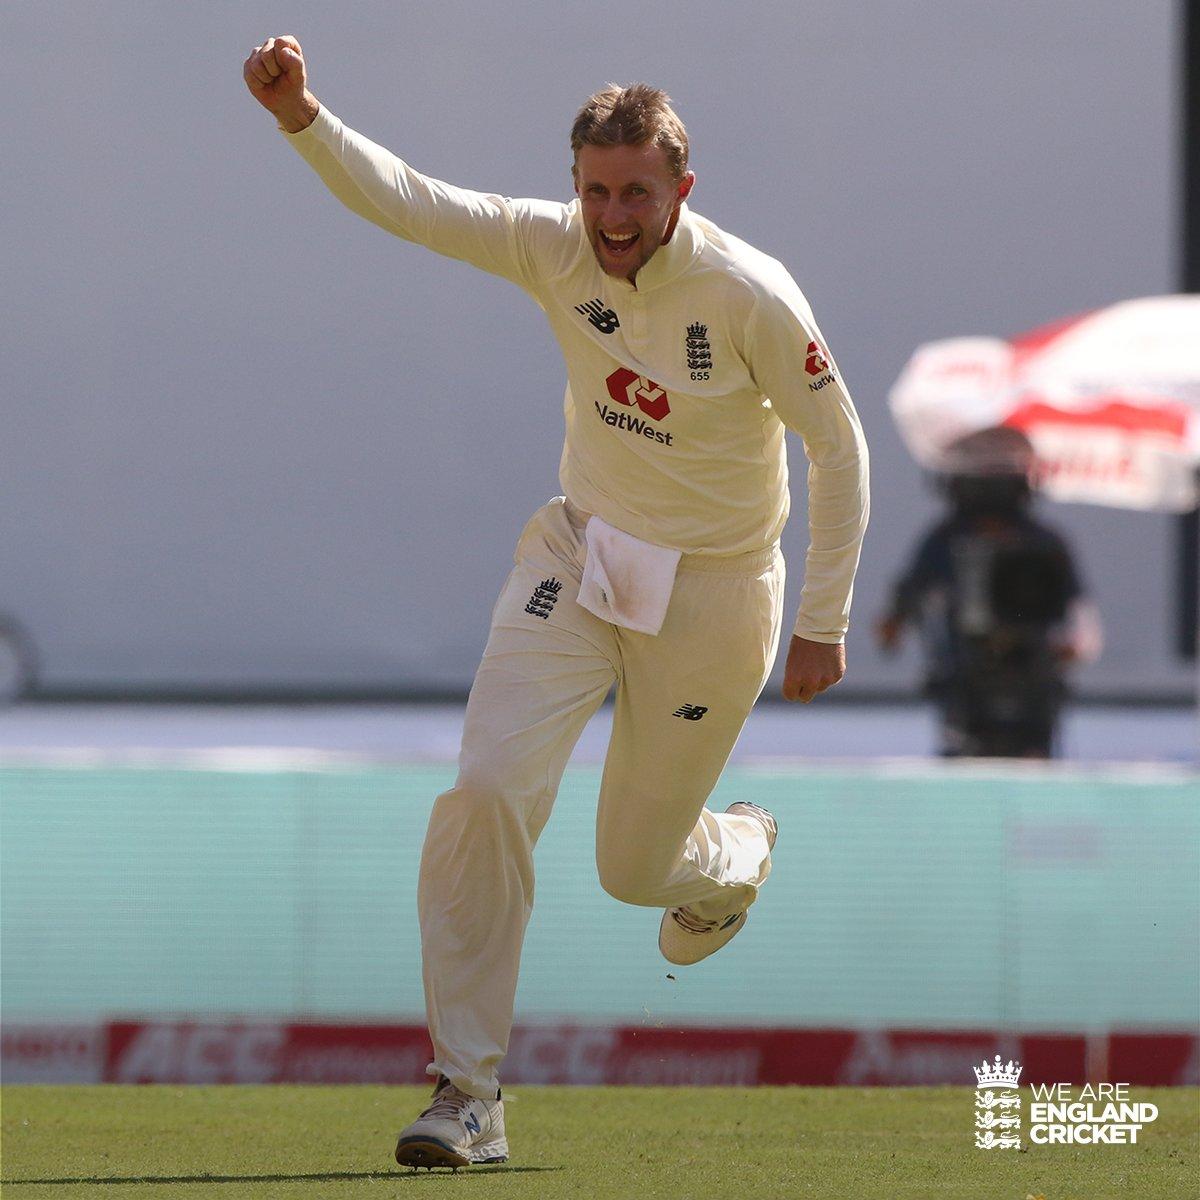 Joe Root | England Cricket/Twitter